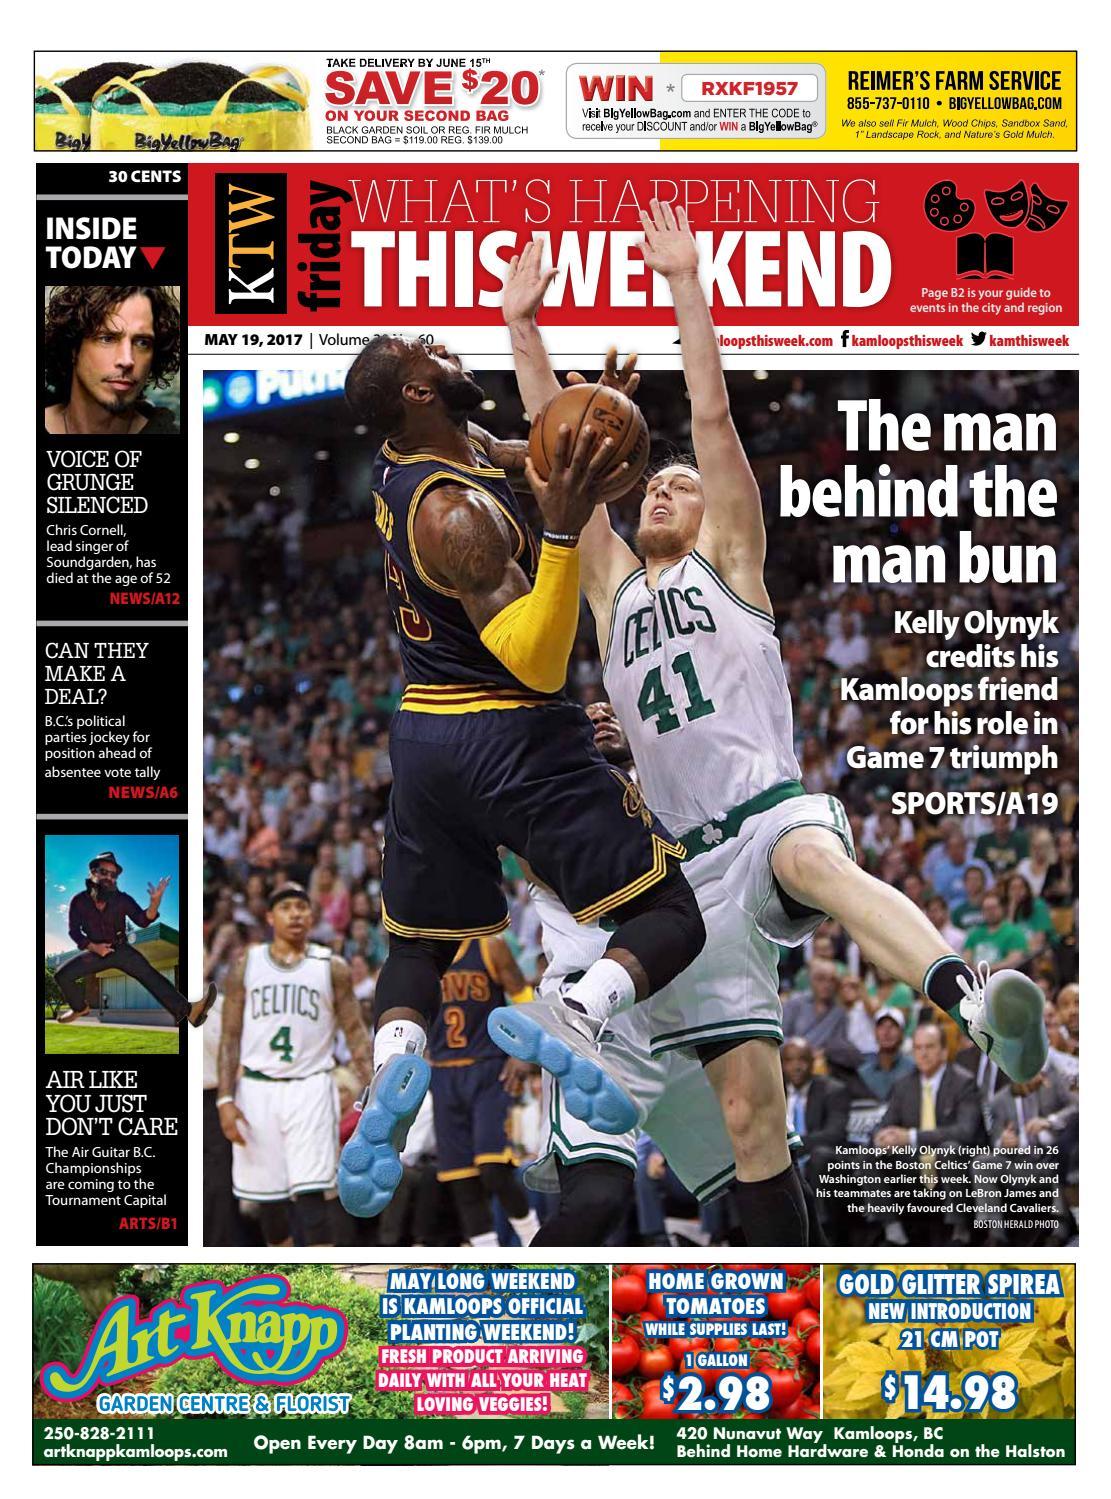 Sporting Goods Basketball Fine 100% Authentic Paul Pierce Celtics Vintage Champion Jersey Size 44 M L Mens To Adopt Advanced Technology